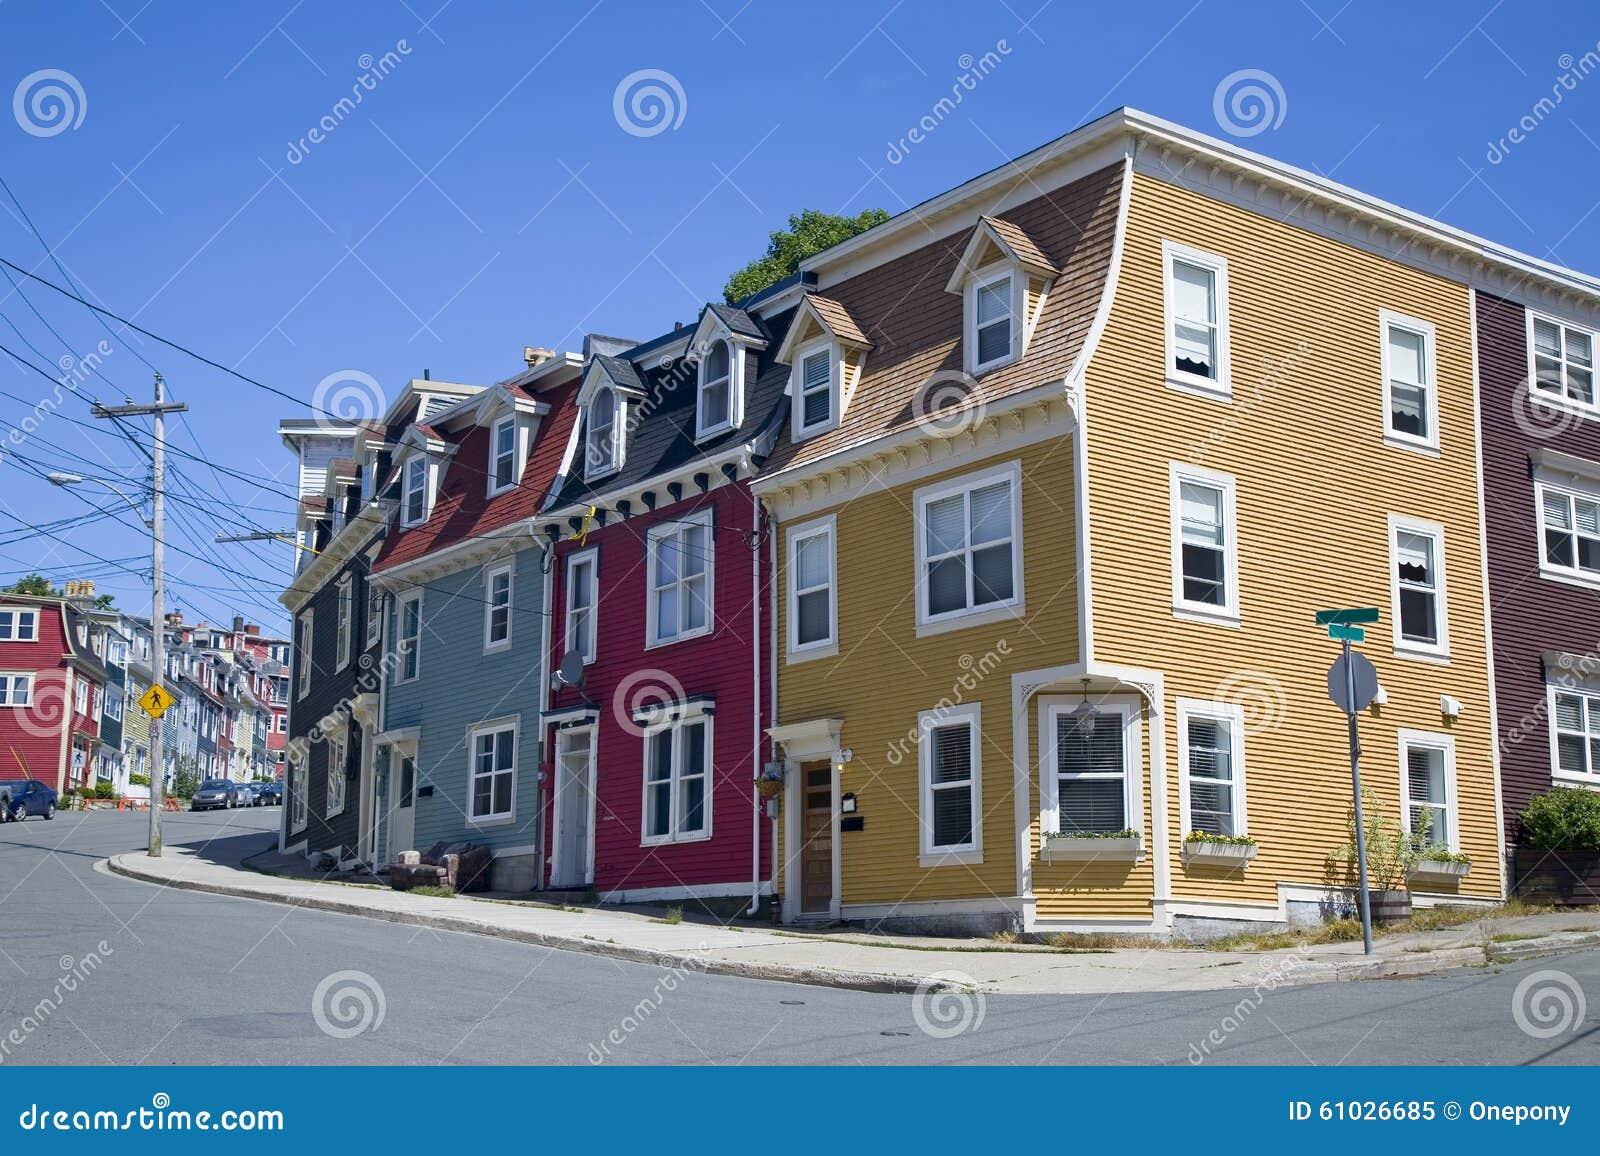 Newfoundland houses stock image image of estate corner for Newfoundland houses